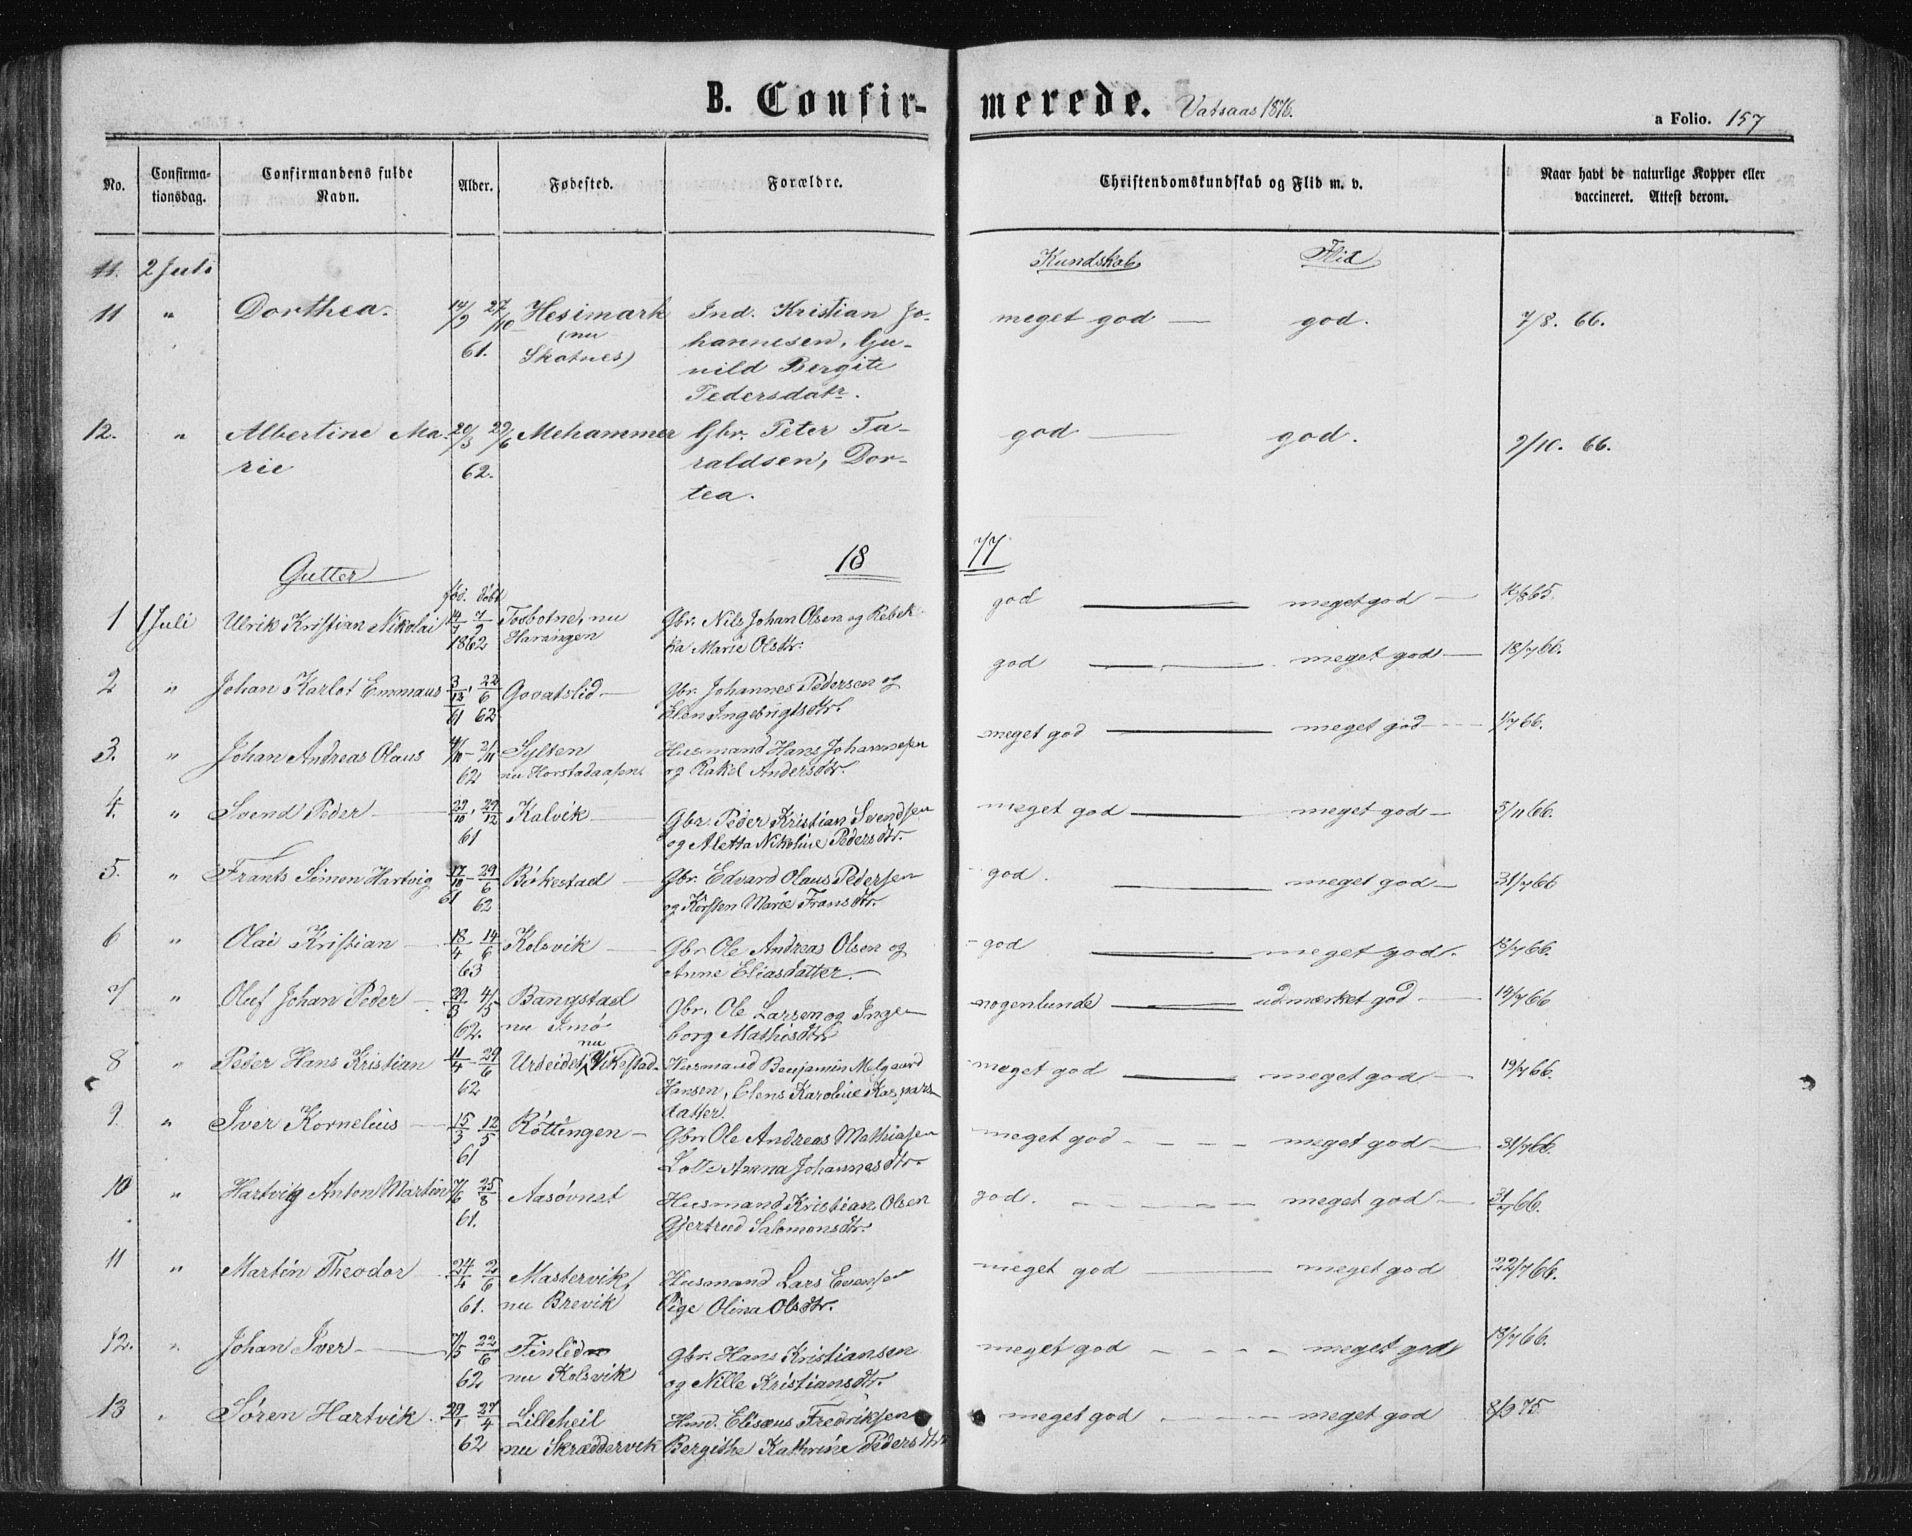 SAT, Ministerialprotokoller, klokkerbøker og fødselsregistre - Nordland, 810/L0158: Klokkerbok nr. 810C02 /1, 1863-1883, s. 157